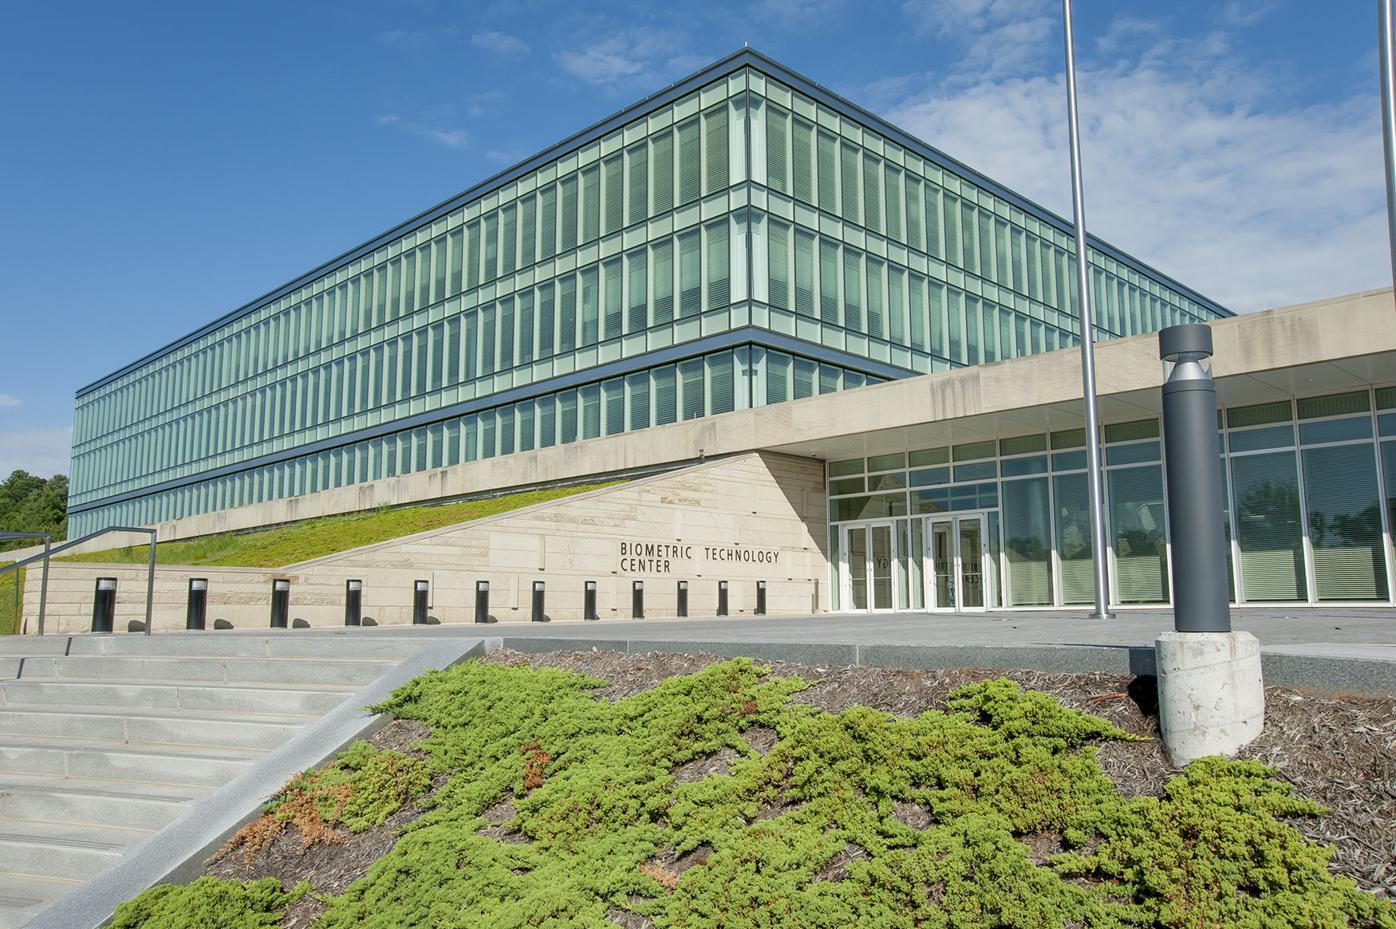 The Biometrics Technology Center